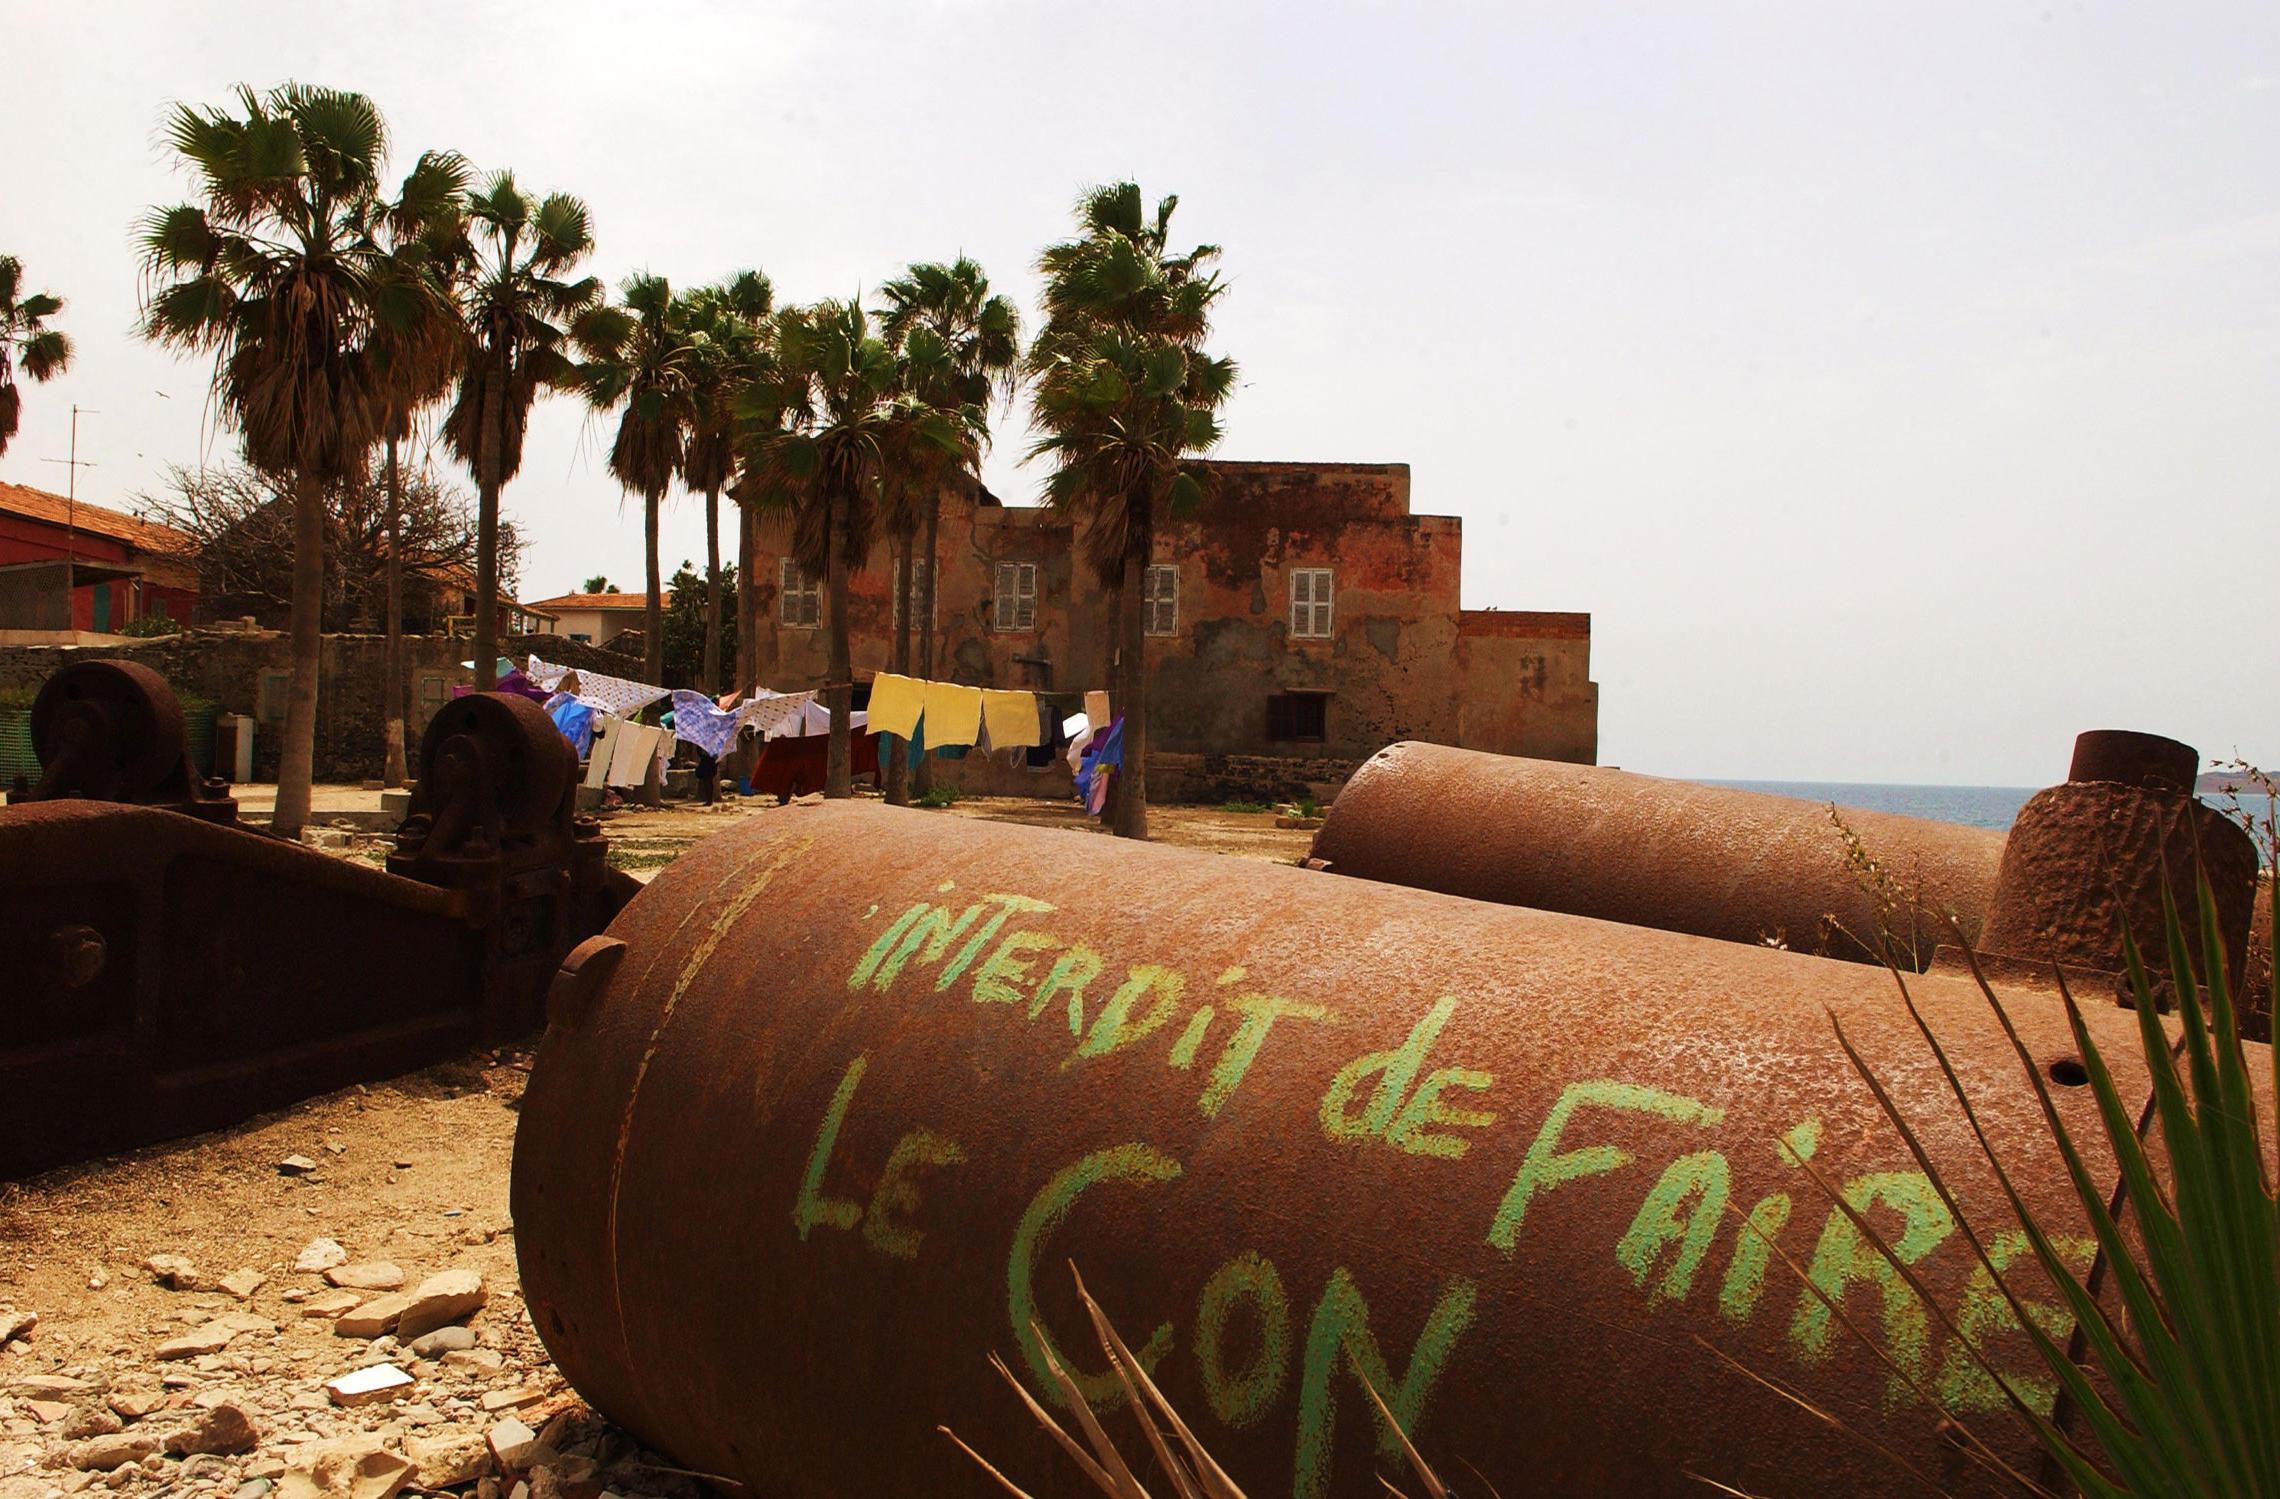 Sénégal, île de Gorée graffiti